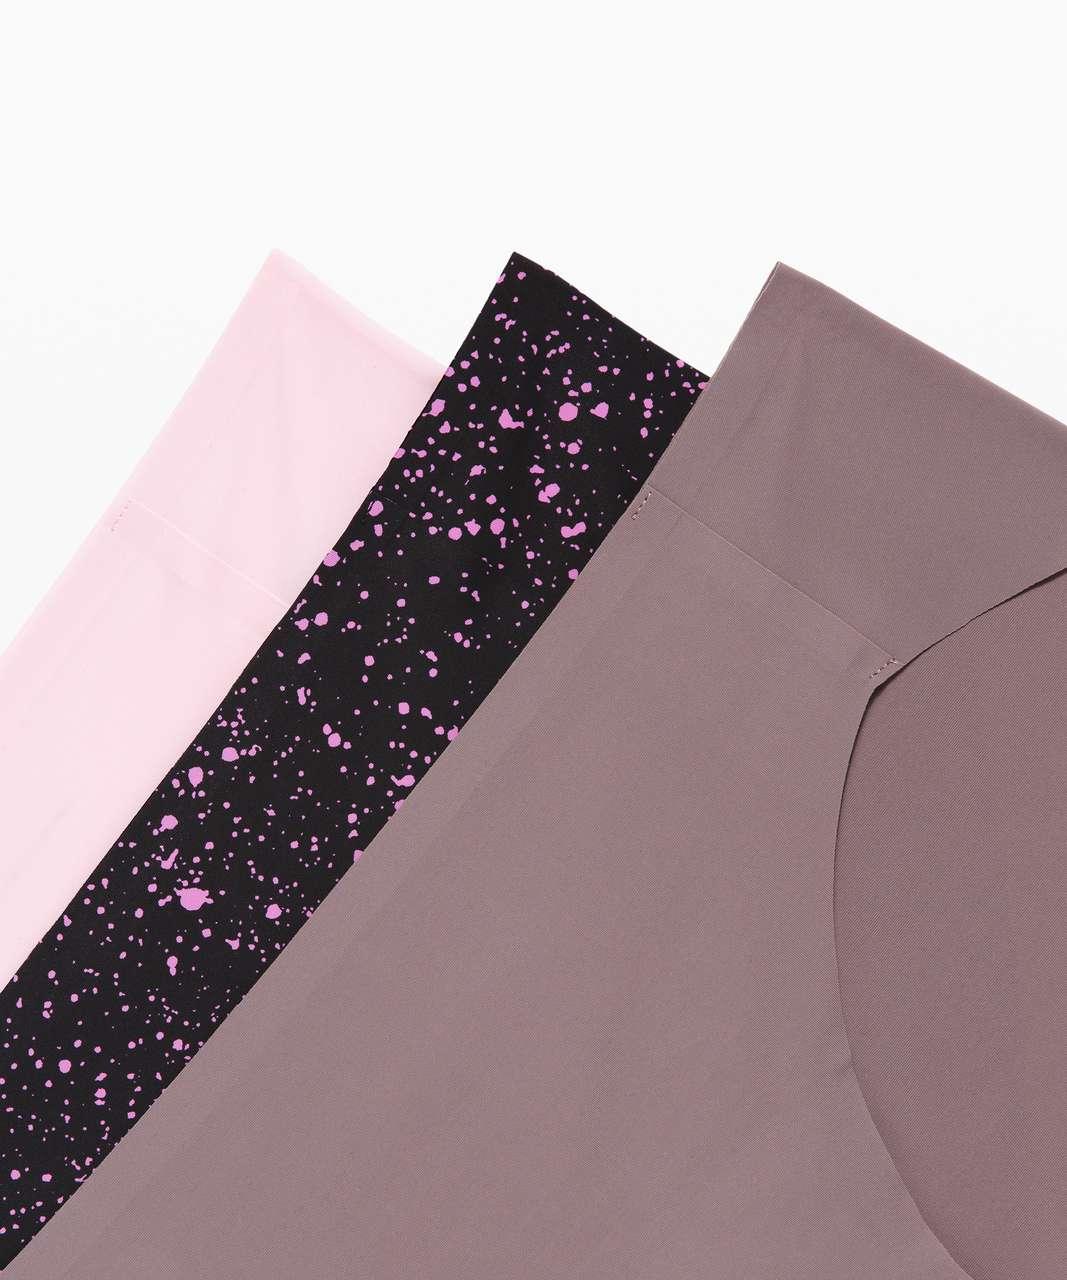 Lululemon Namastay Put Hipster 3 Pack - Blissful Pink / Sea Spray Invert Magenta Glow Black / Lunar Rock